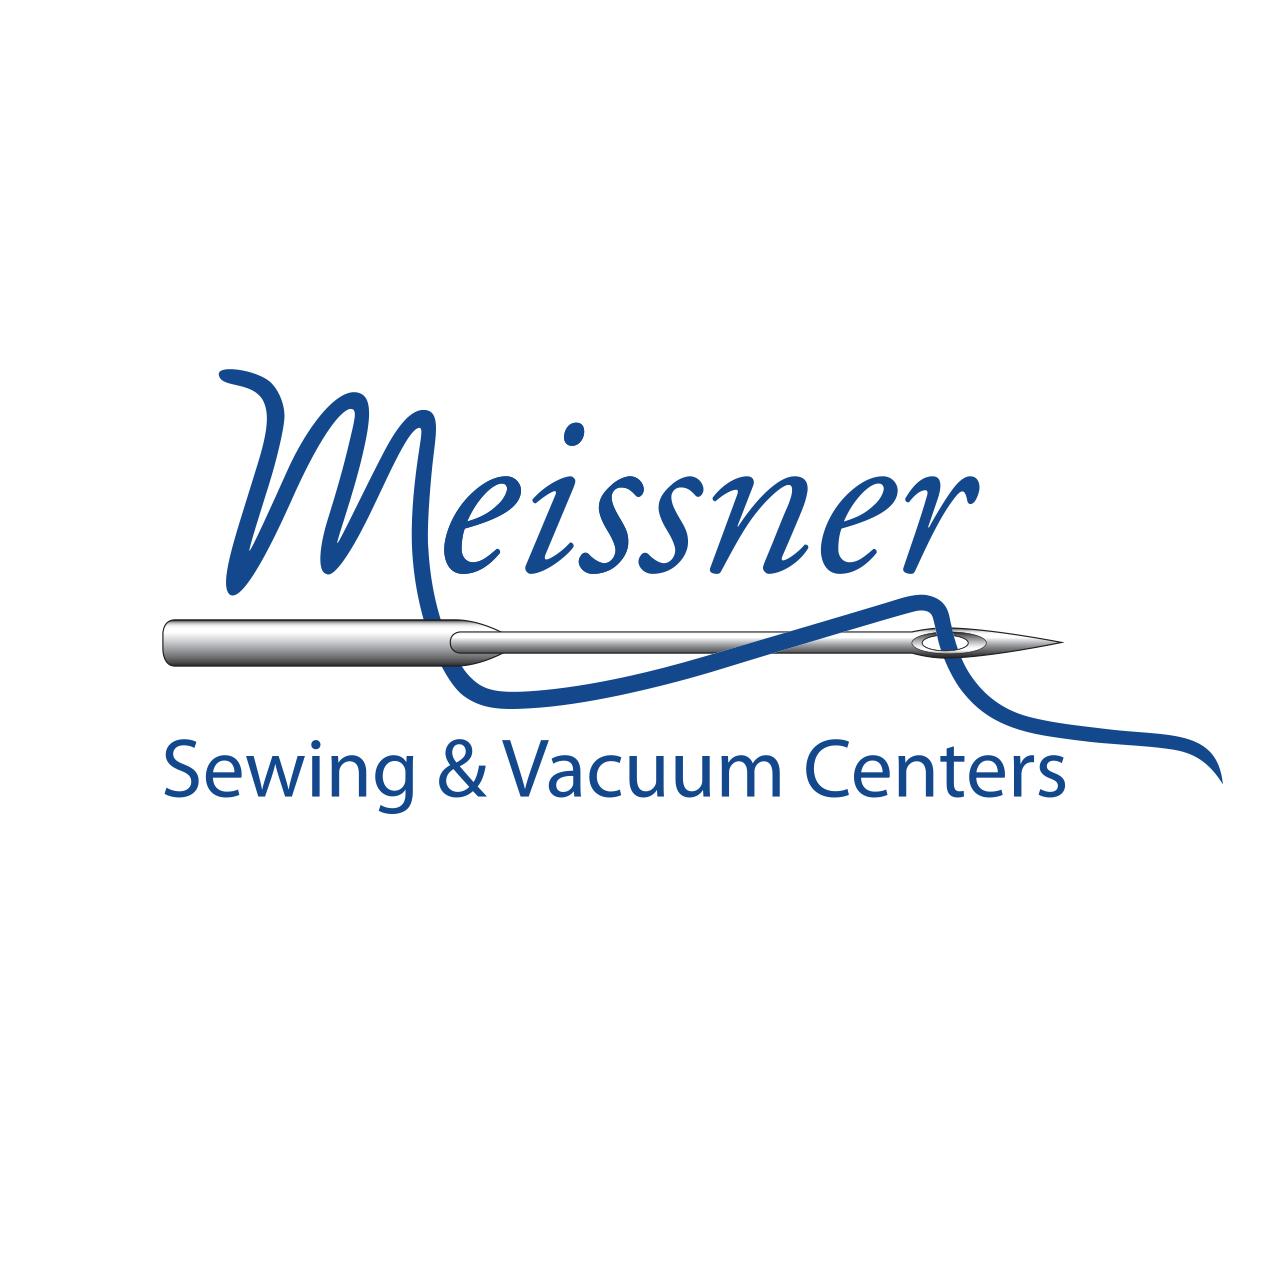 Baby Lock Solaris Sewing Quilting Embroidery Machine Meissner Impressive Sewing Machine Repair San Jose